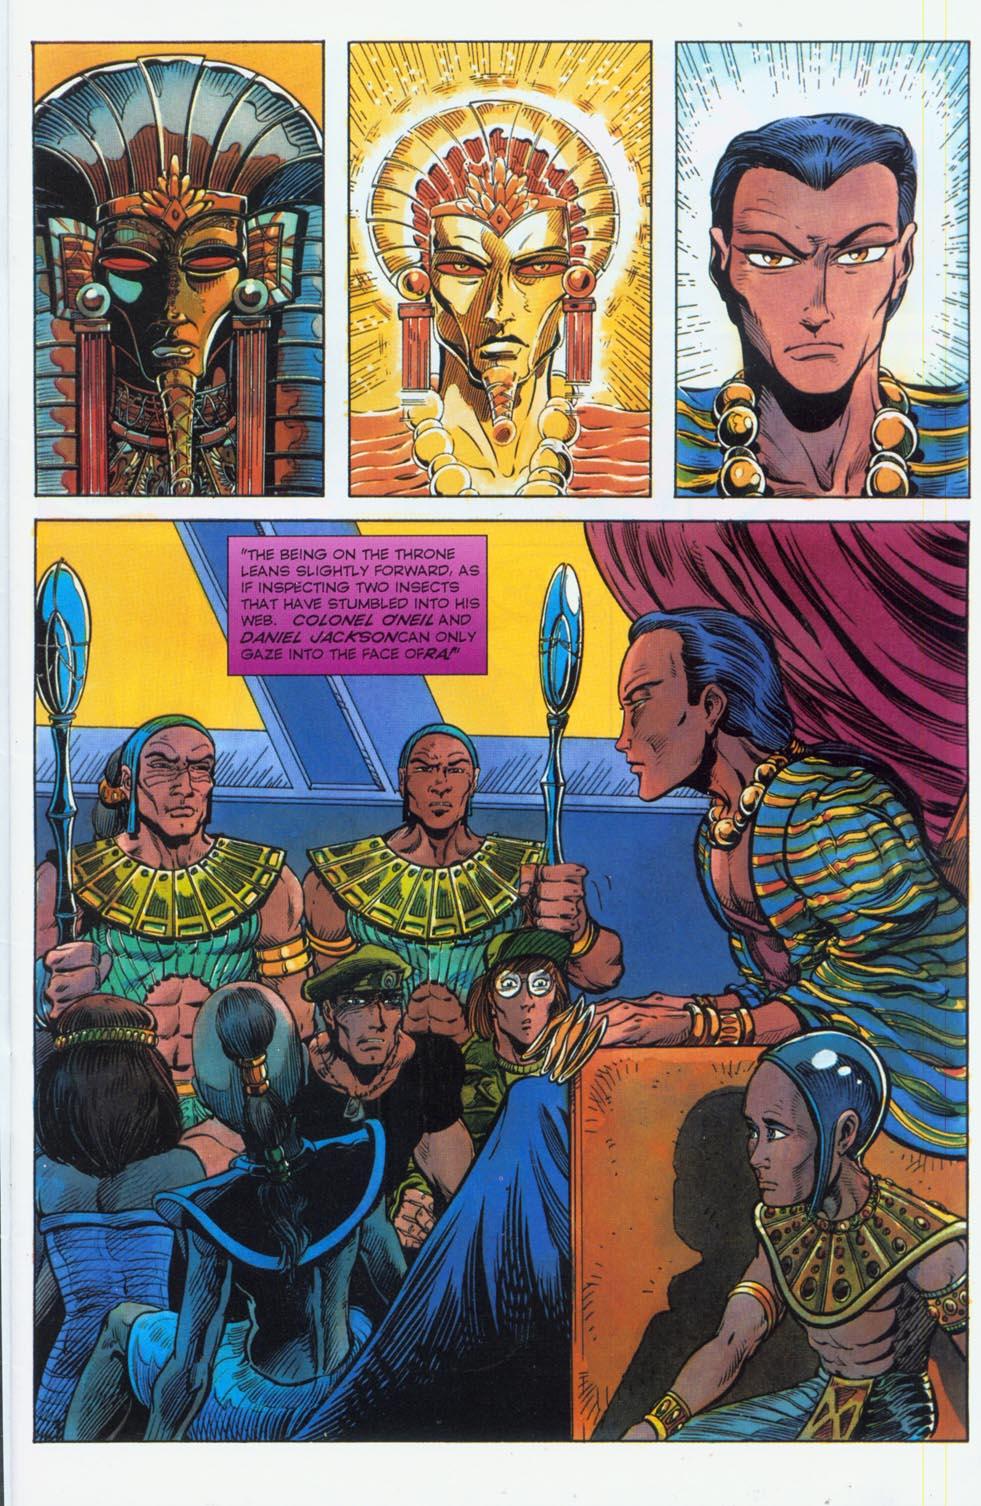 Read online Stargate comic -  Issue #3 - 3